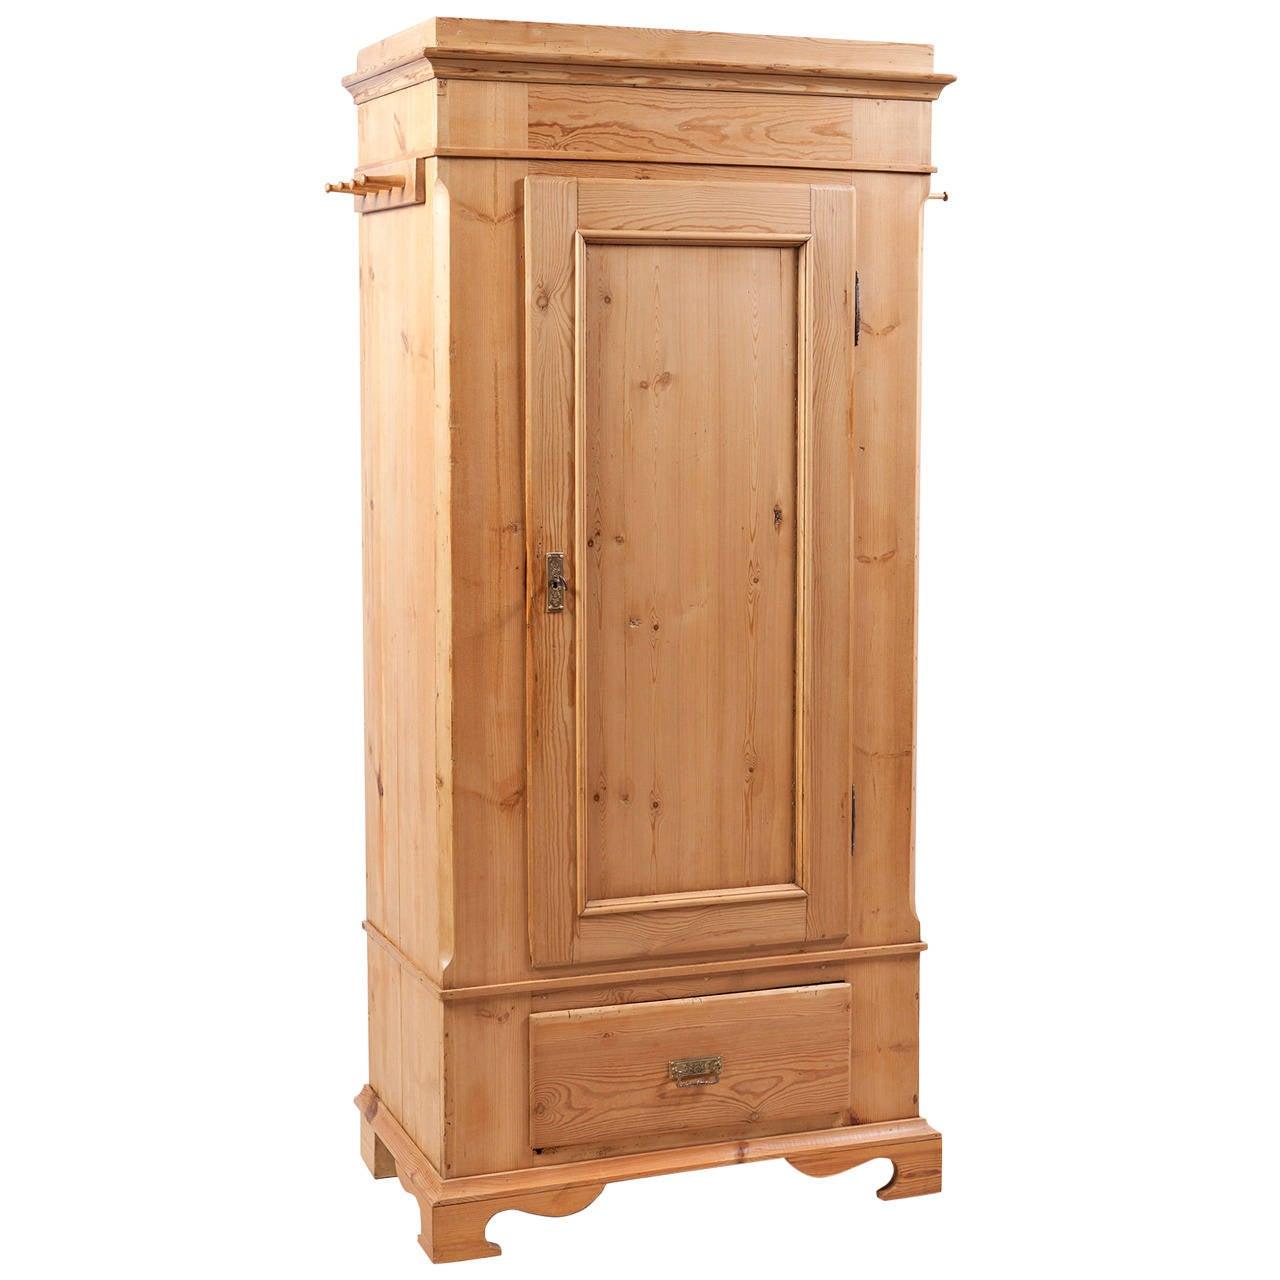 Single Door Danish Wardrobe Armoire In Pine, Circa 1845 1